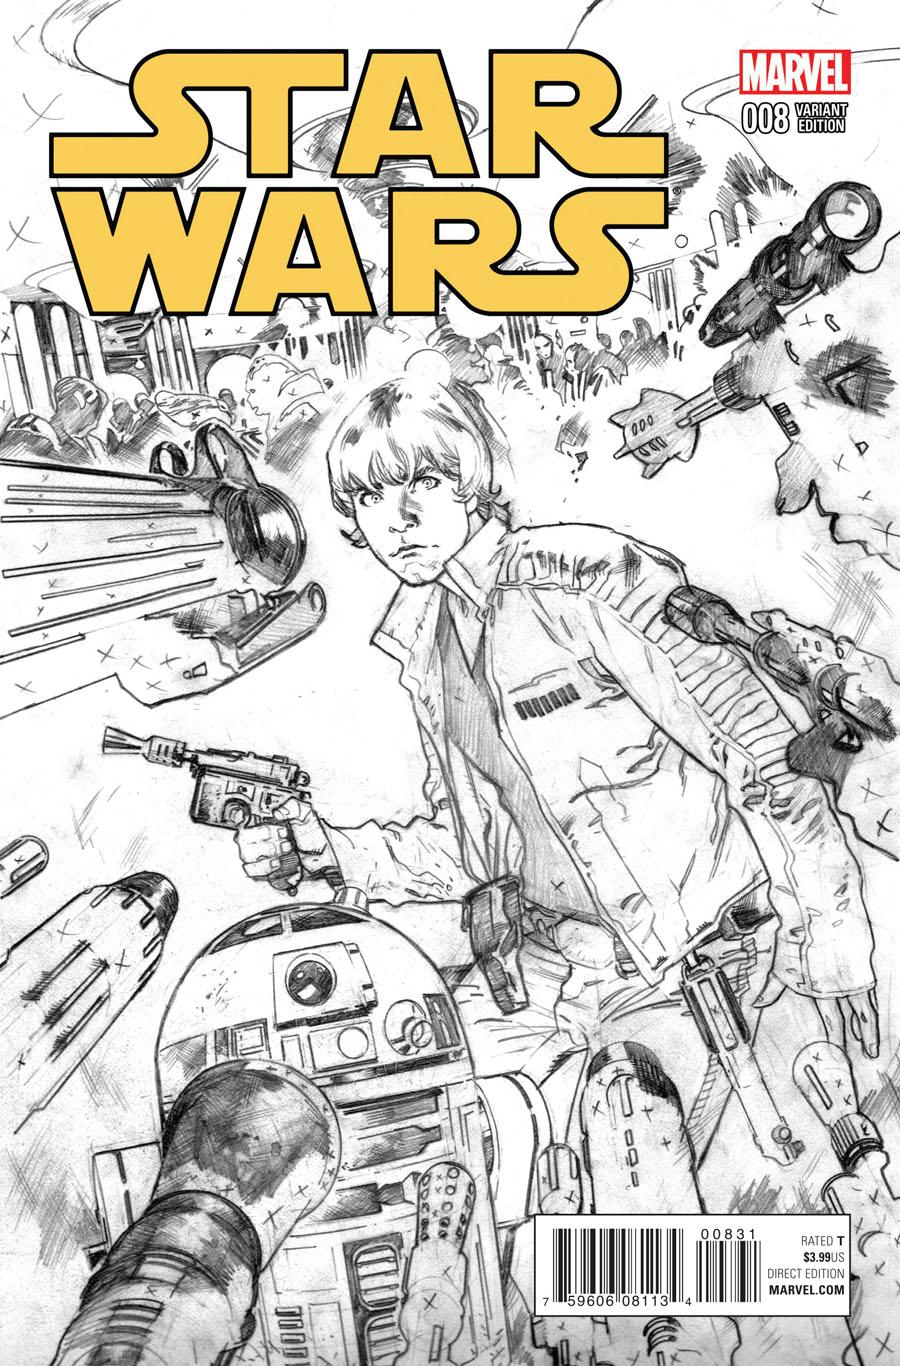 Star Wars Vol 4 #8 Cover D Incentive Stuart Immonen Sketch Cover